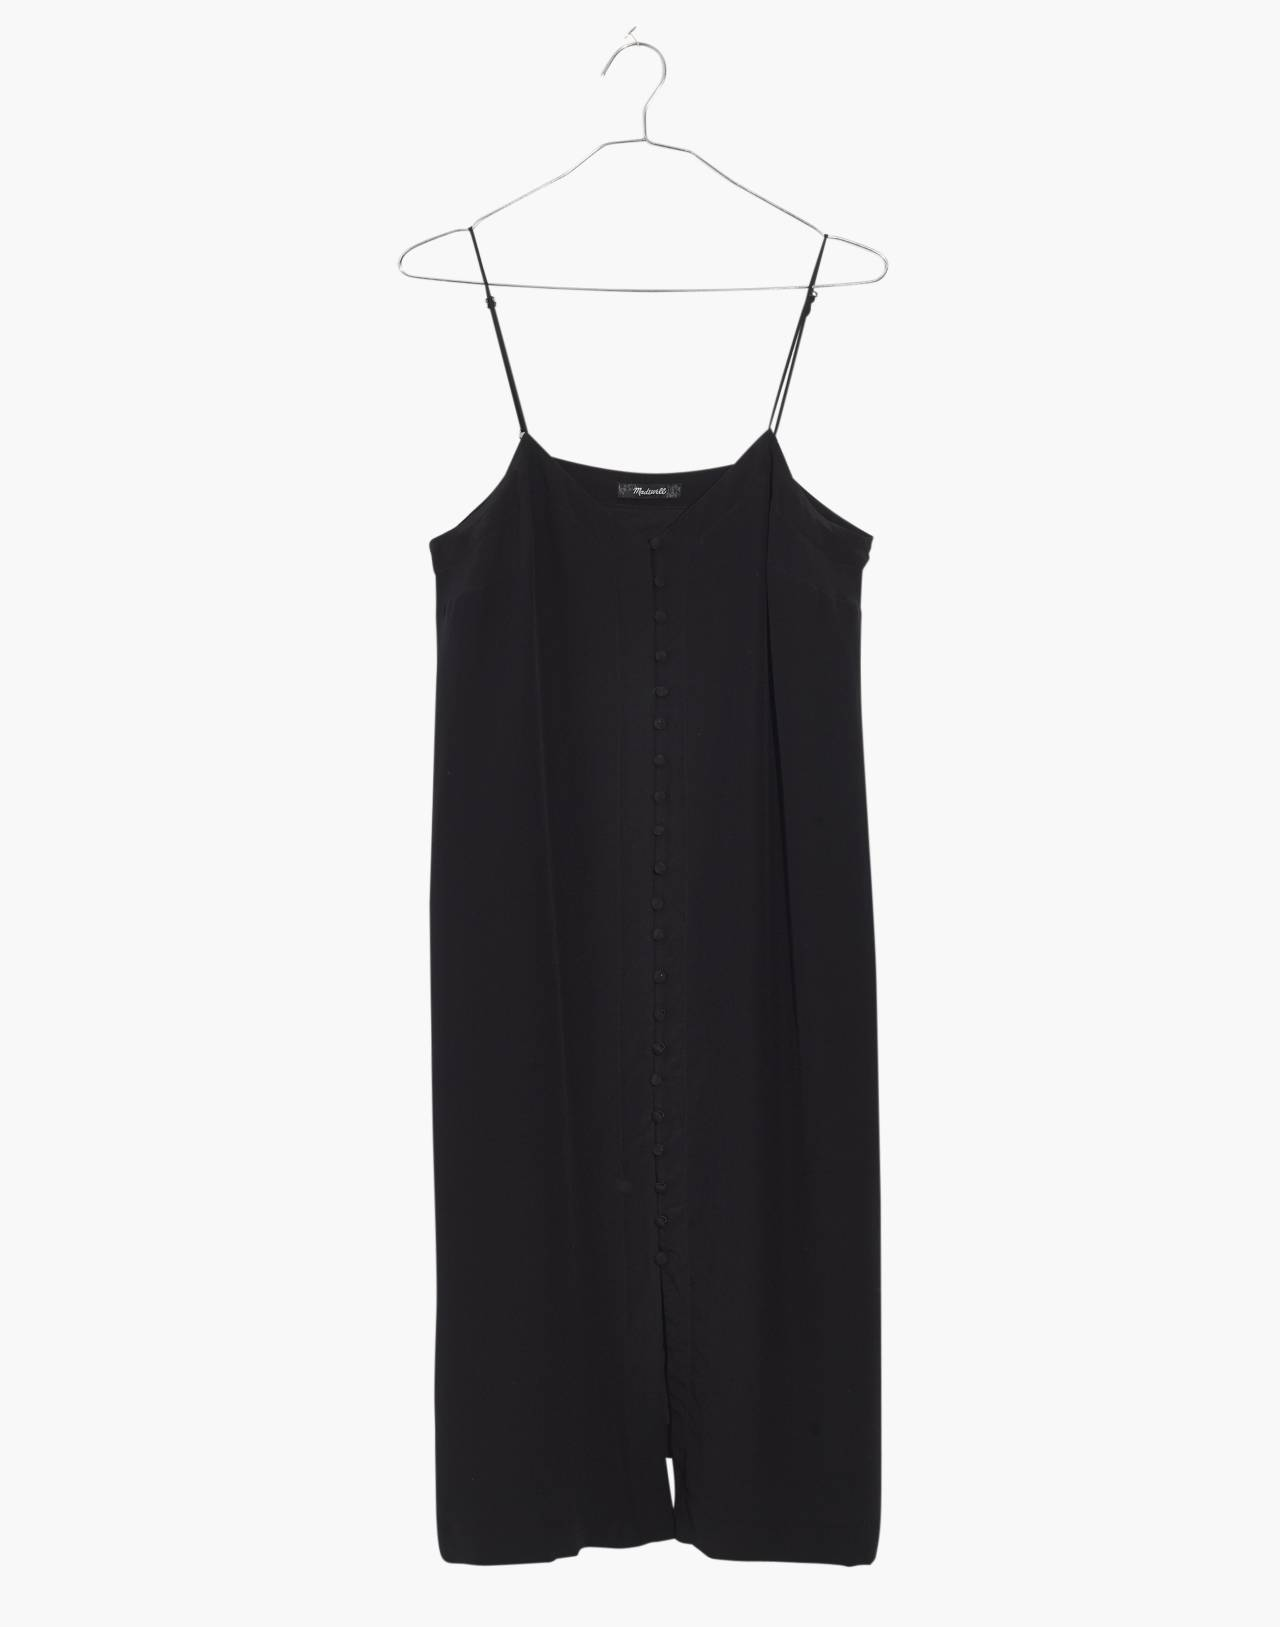 Silk Button-Front Slip Dress in true black image 4